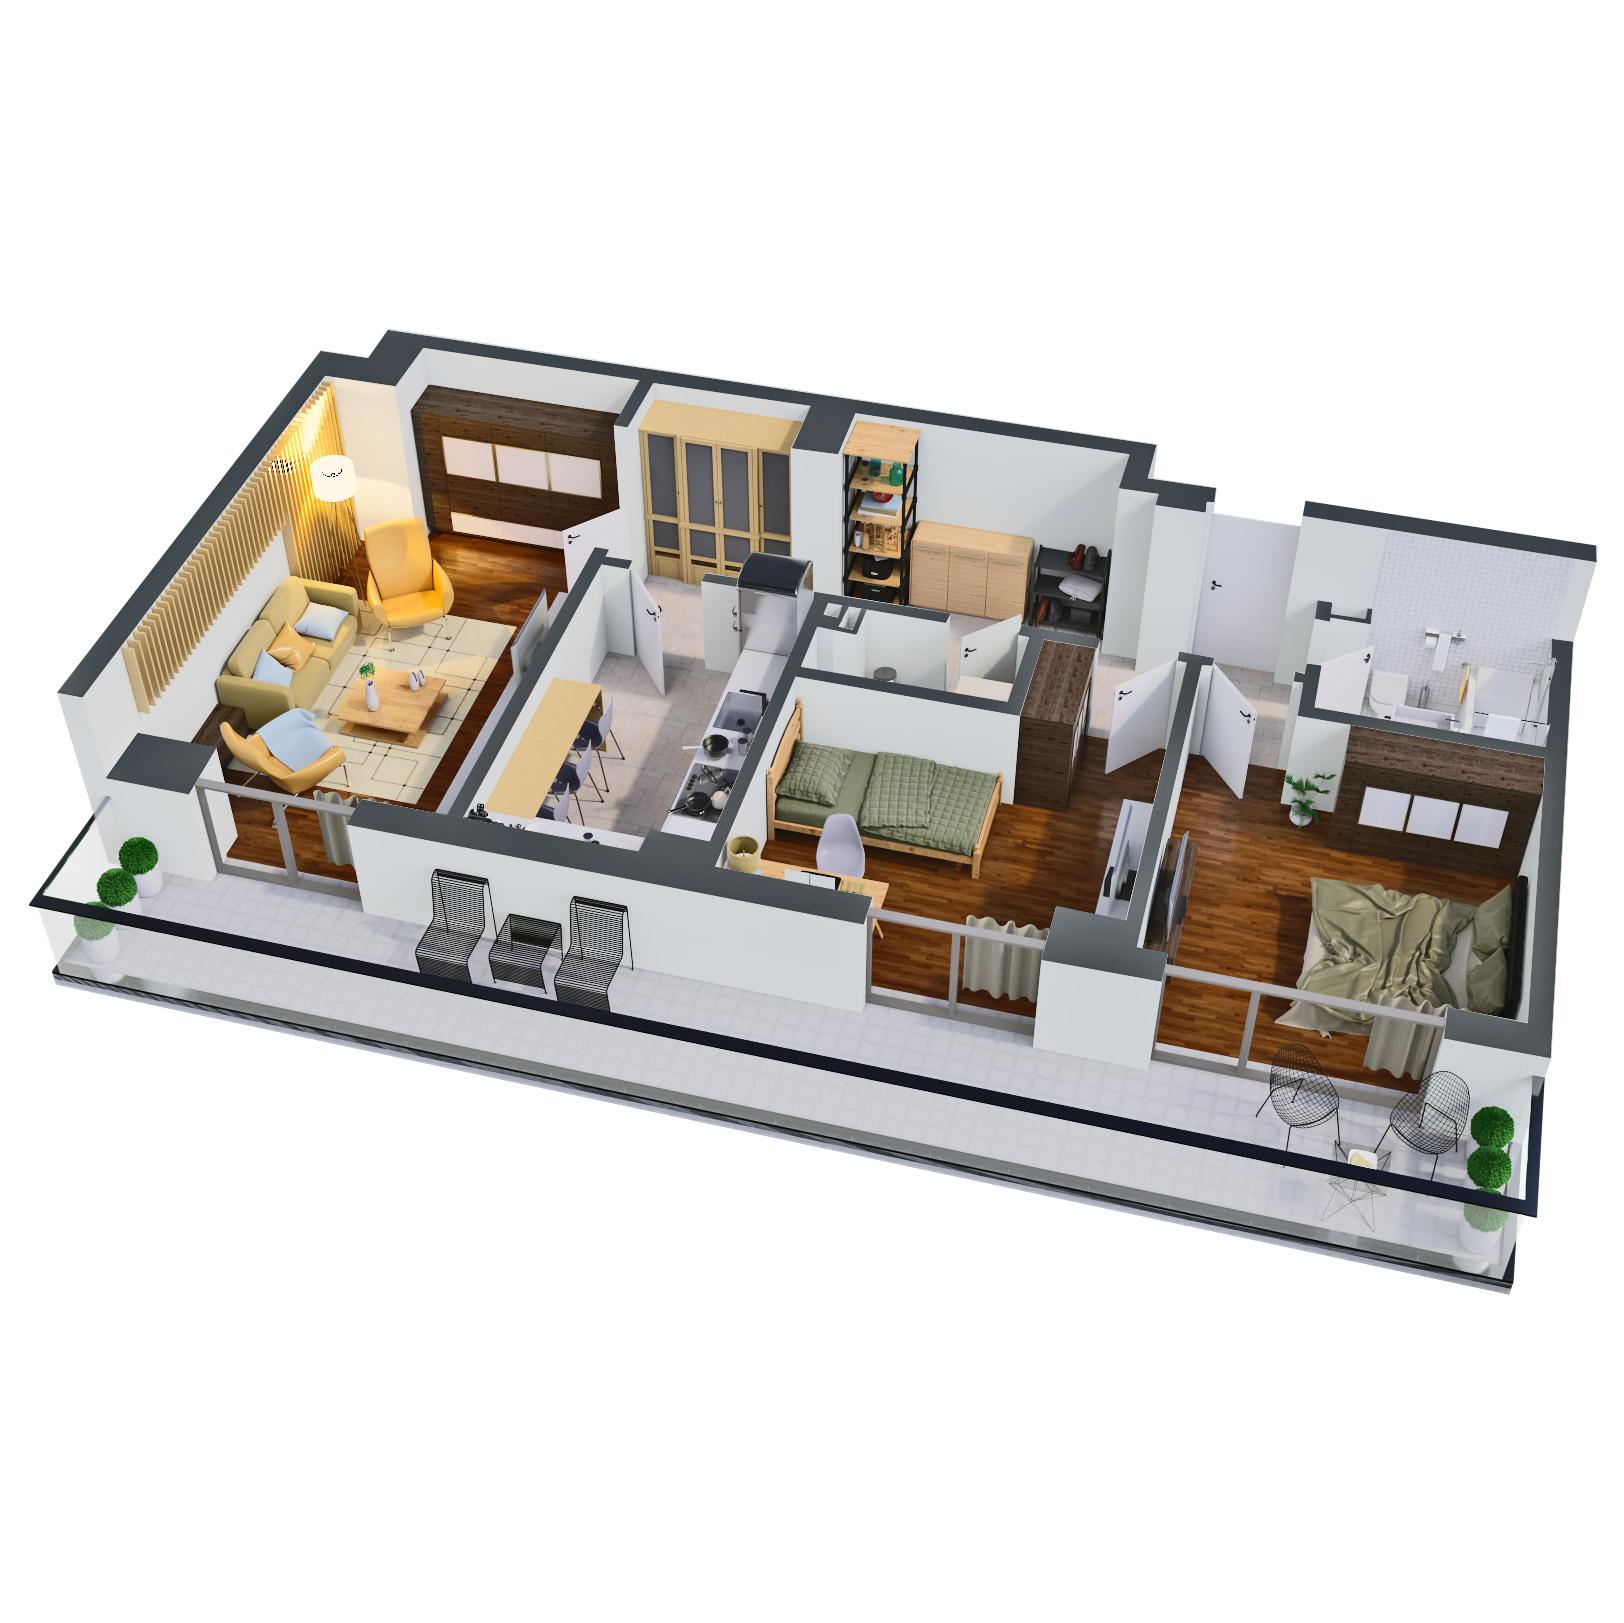 Apartament 3 camere de vanzare Bucuresti - Catedral Residence - Marriott, Piata Unirii, 13 Septembrie, Izvor - Tip 5 - T2 - B